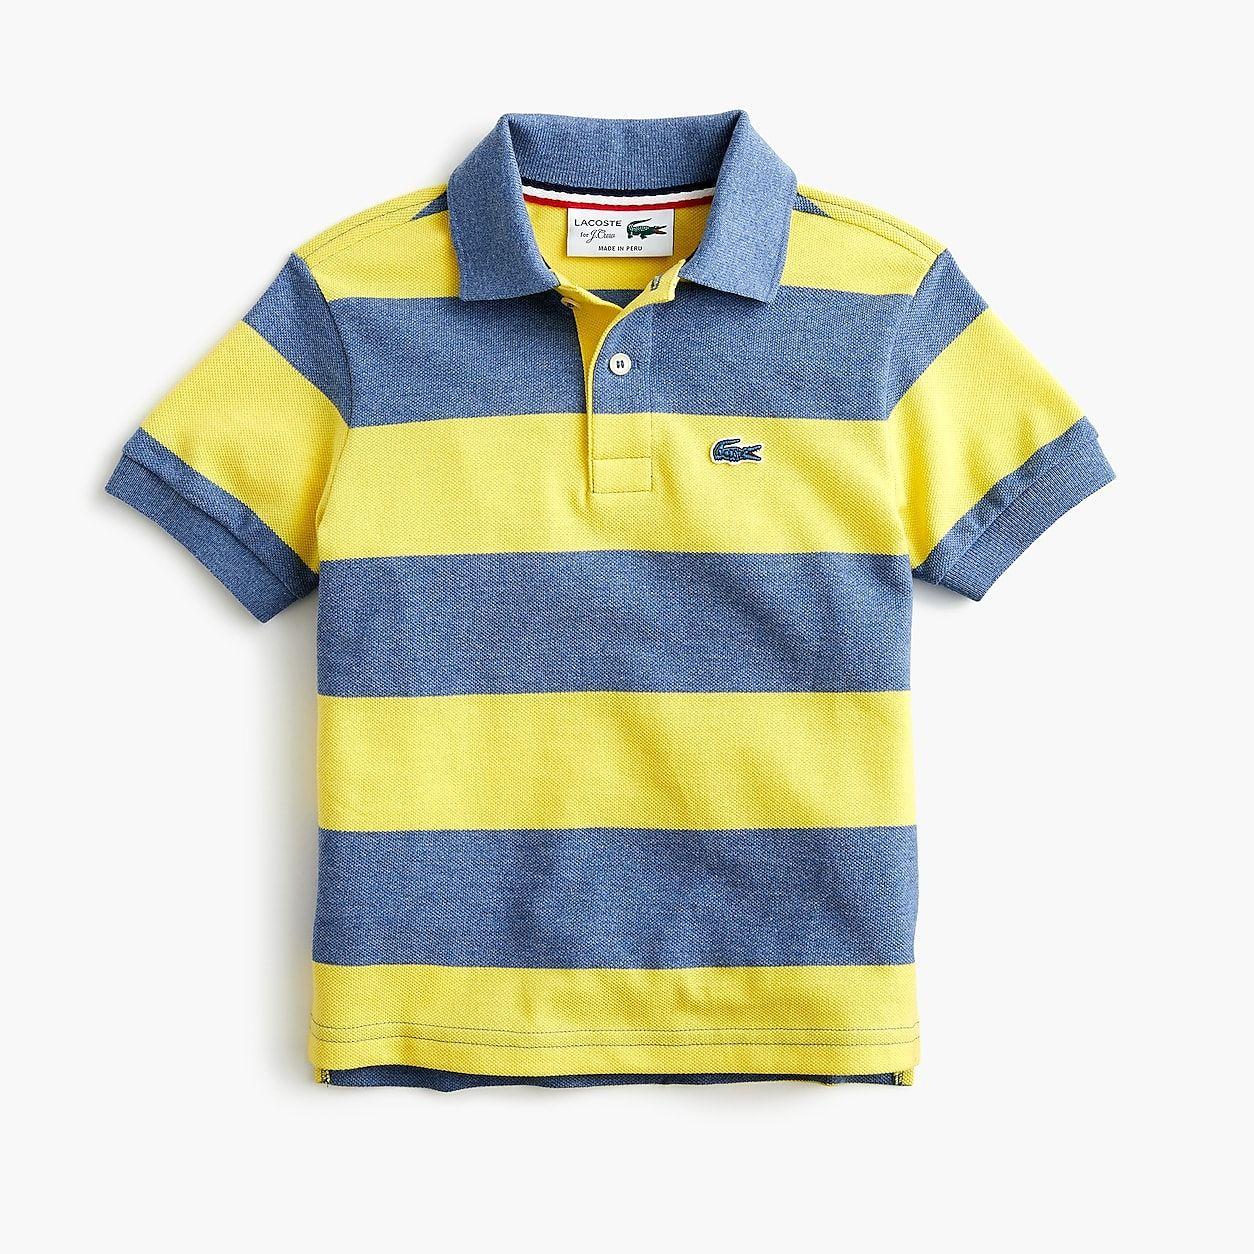 6856d64f crewcuts Lacoste For J.Crew Striped Polo Shirt | Boy fashion | Polo ...